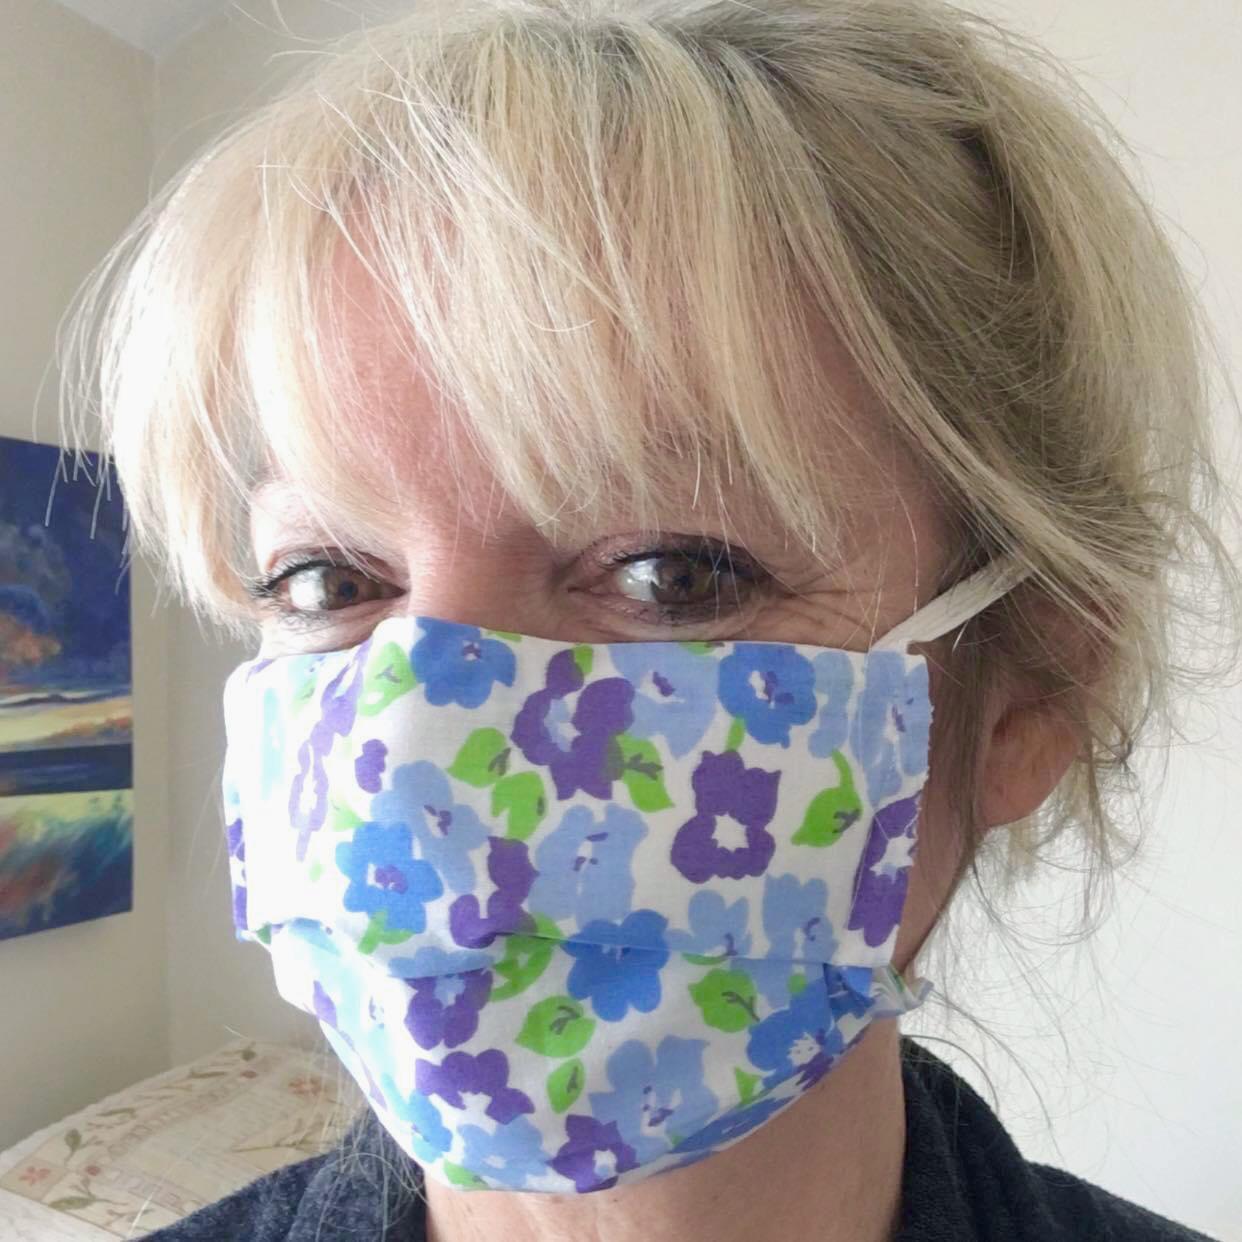 Liz, wearing a patterned mask